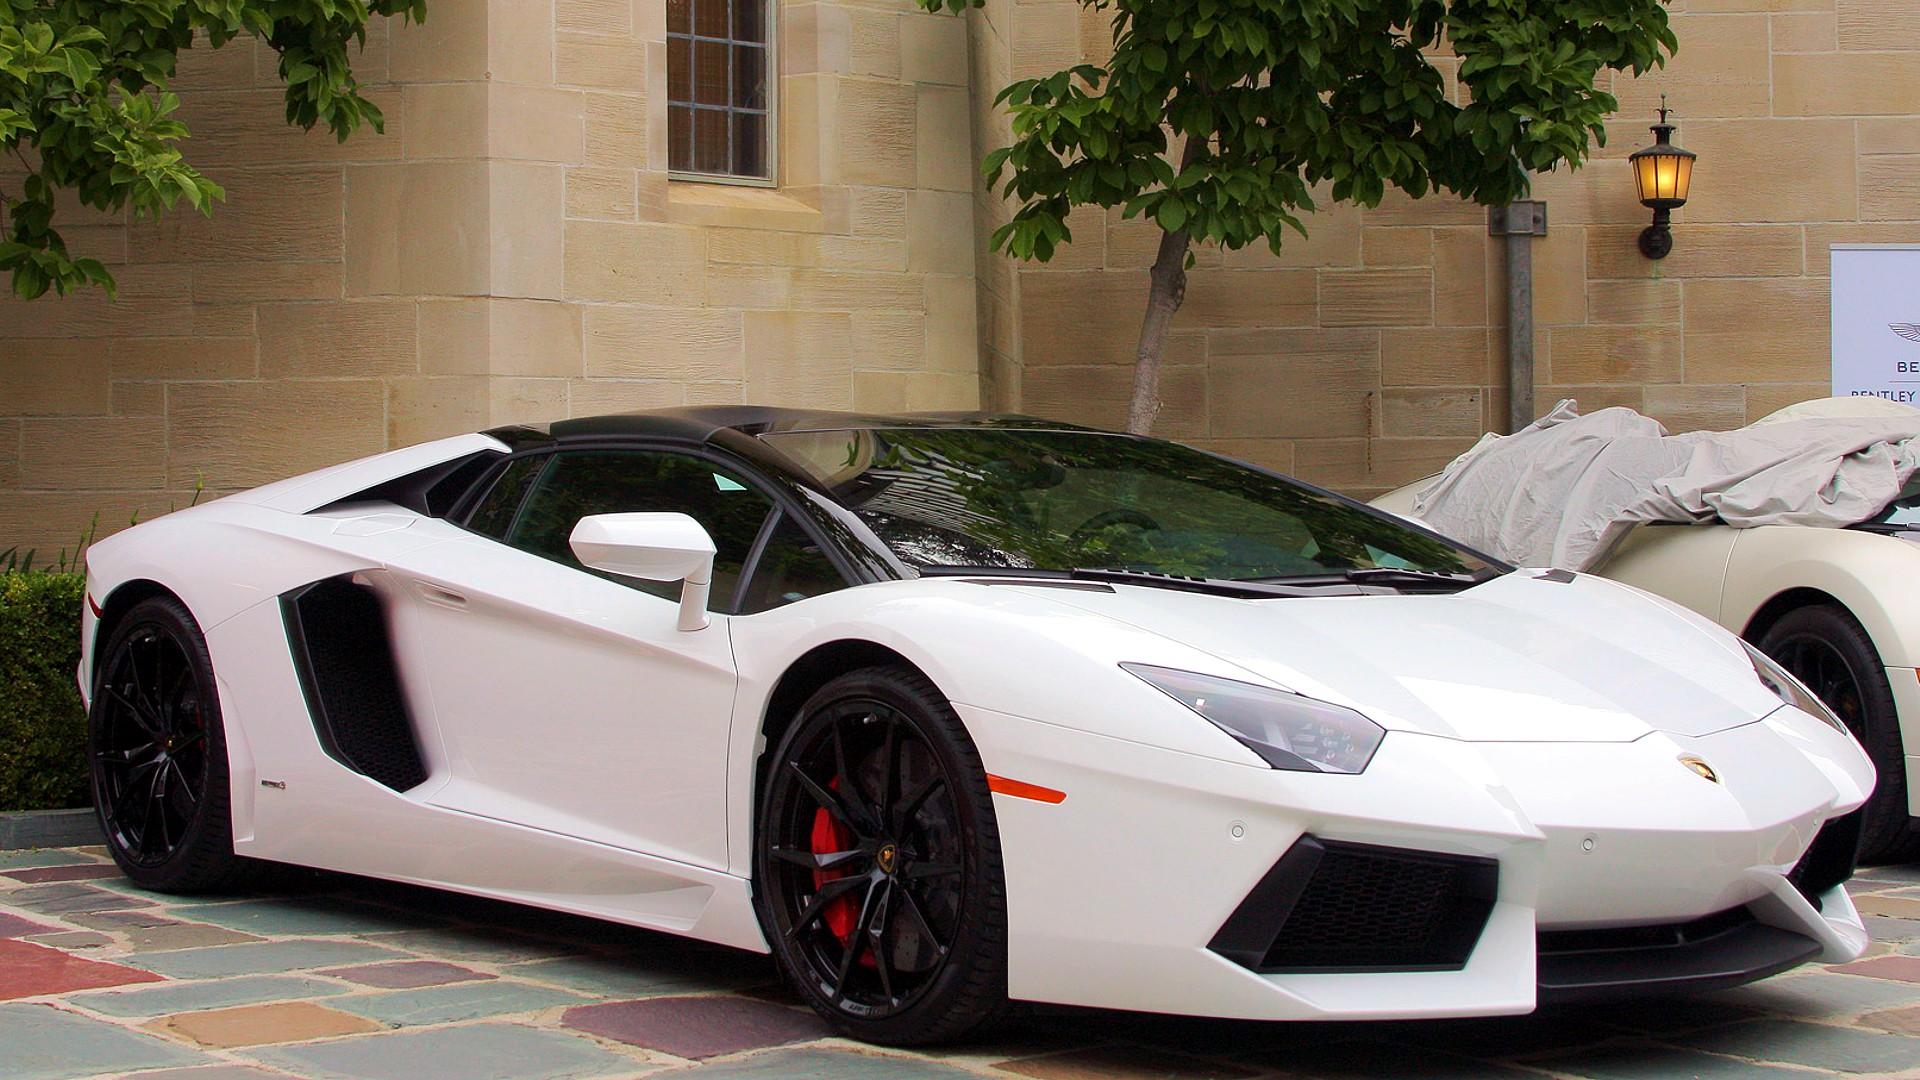 carslike 2014 Lamborghini Aventador